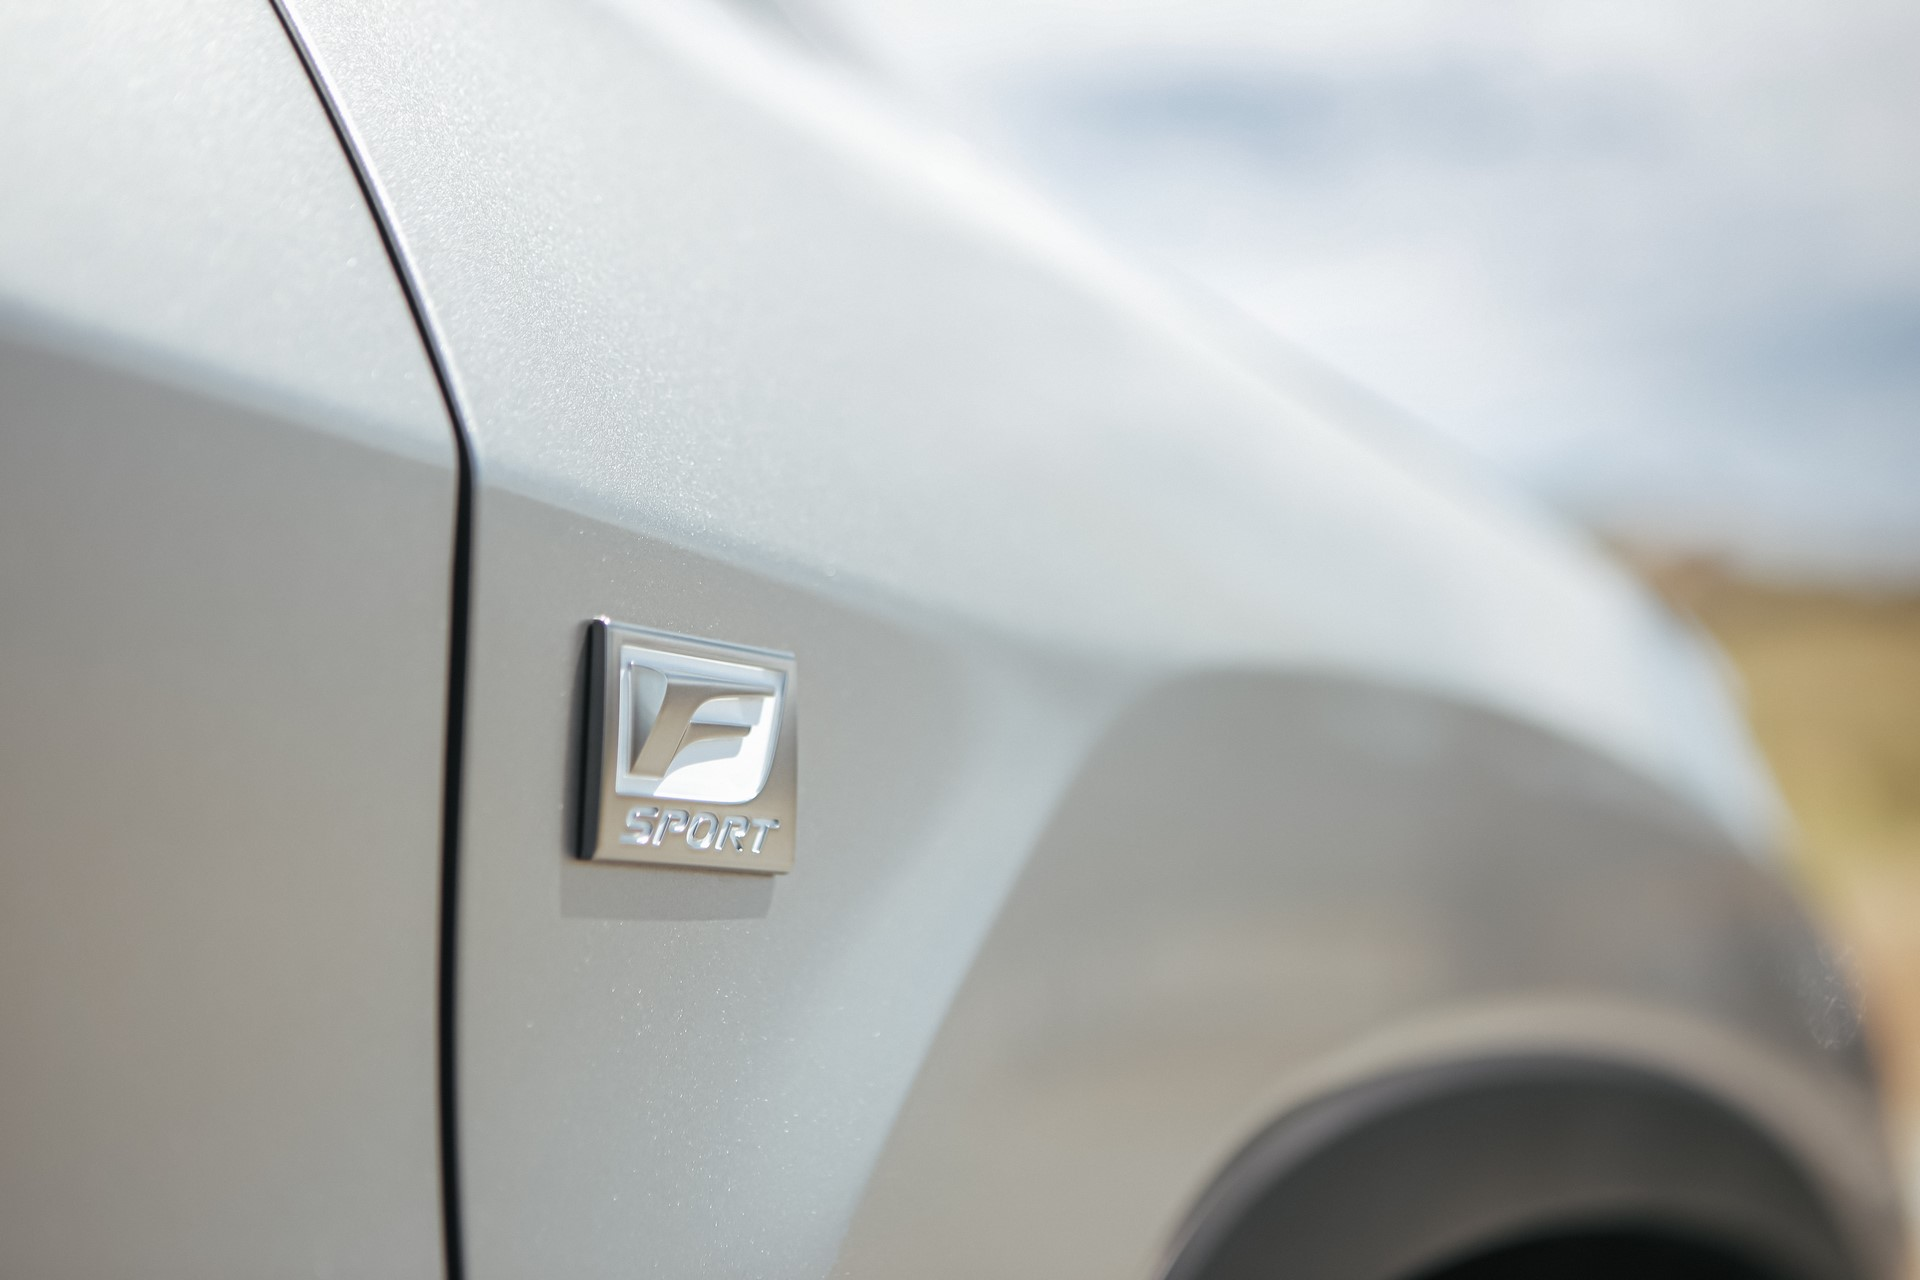 2020_Lexus_RX_350_F_SPORT_12_6C02F68A0526542E149E6BCEA95E88A8DB7E15ED